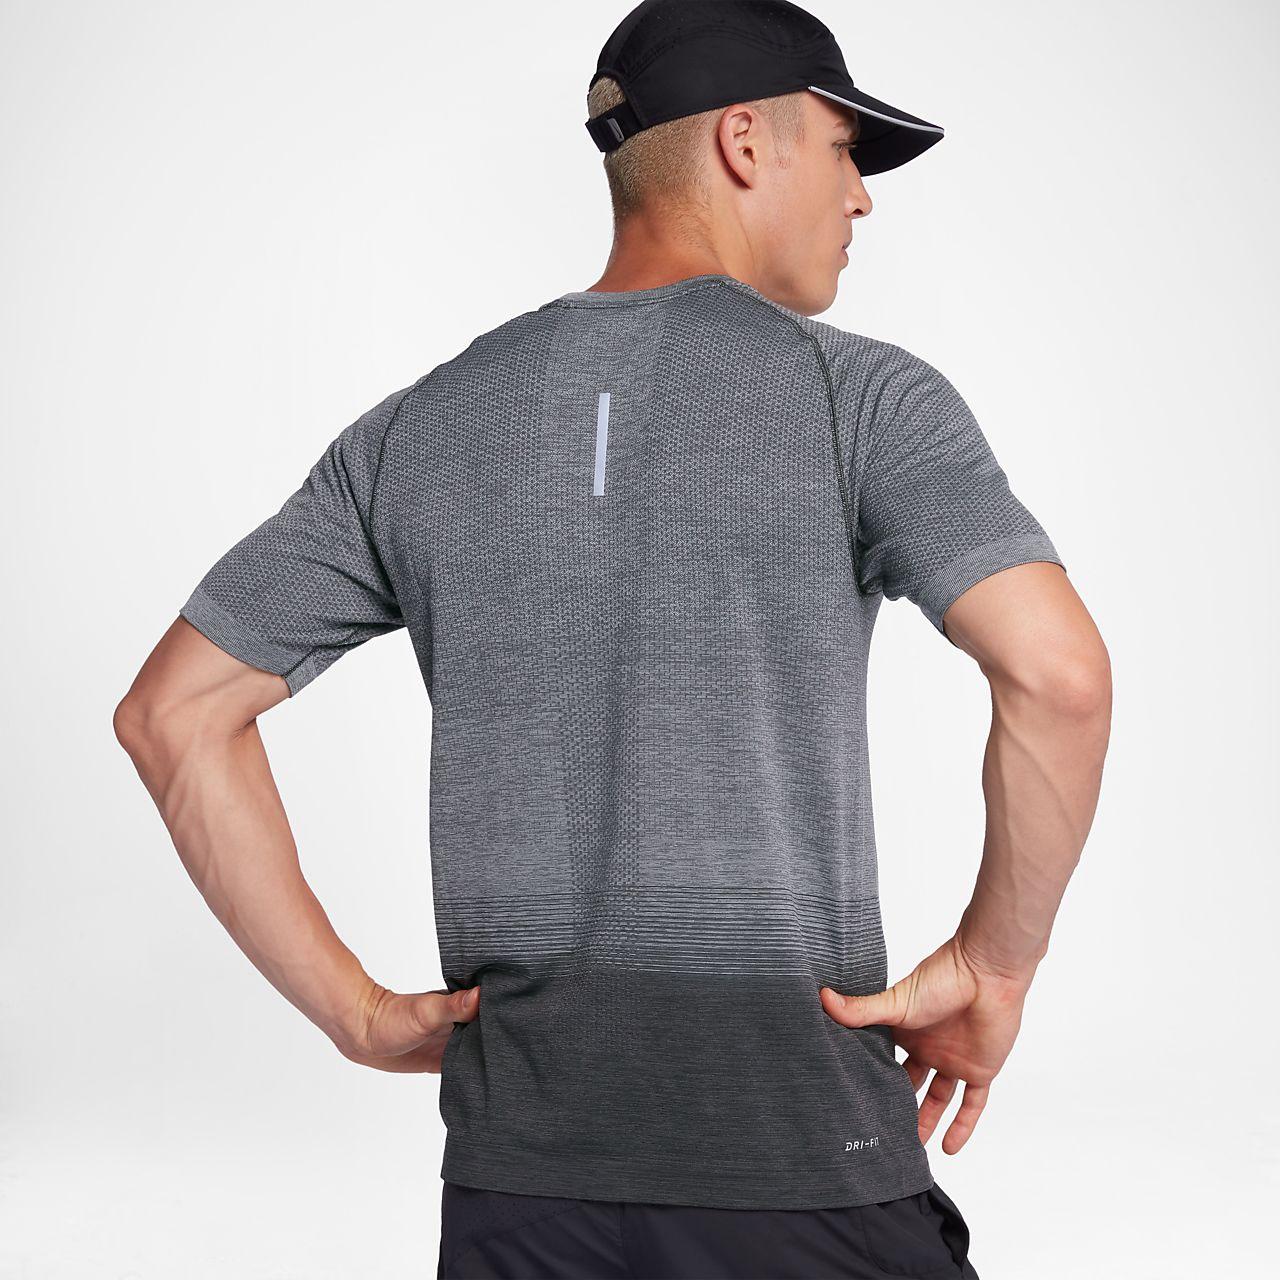 ... Nike Dri-FIT Knit Men's Short-Sleeve Running Top